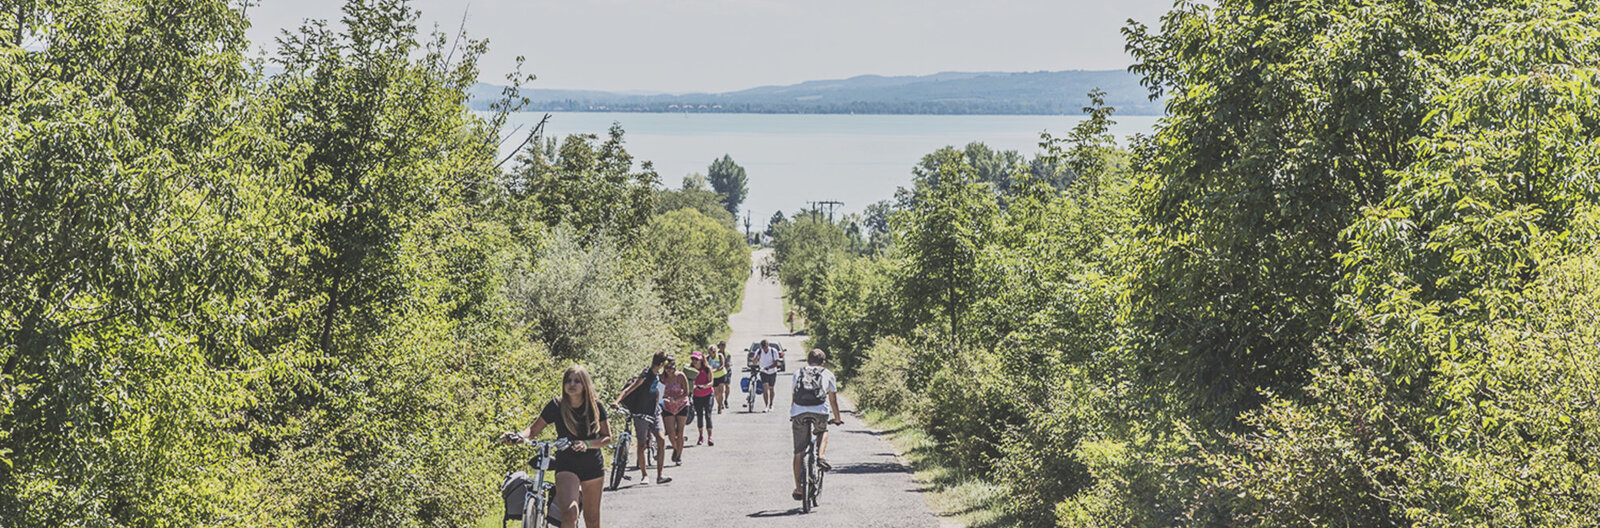 8 great rest stops on the Balaton Bike Ring